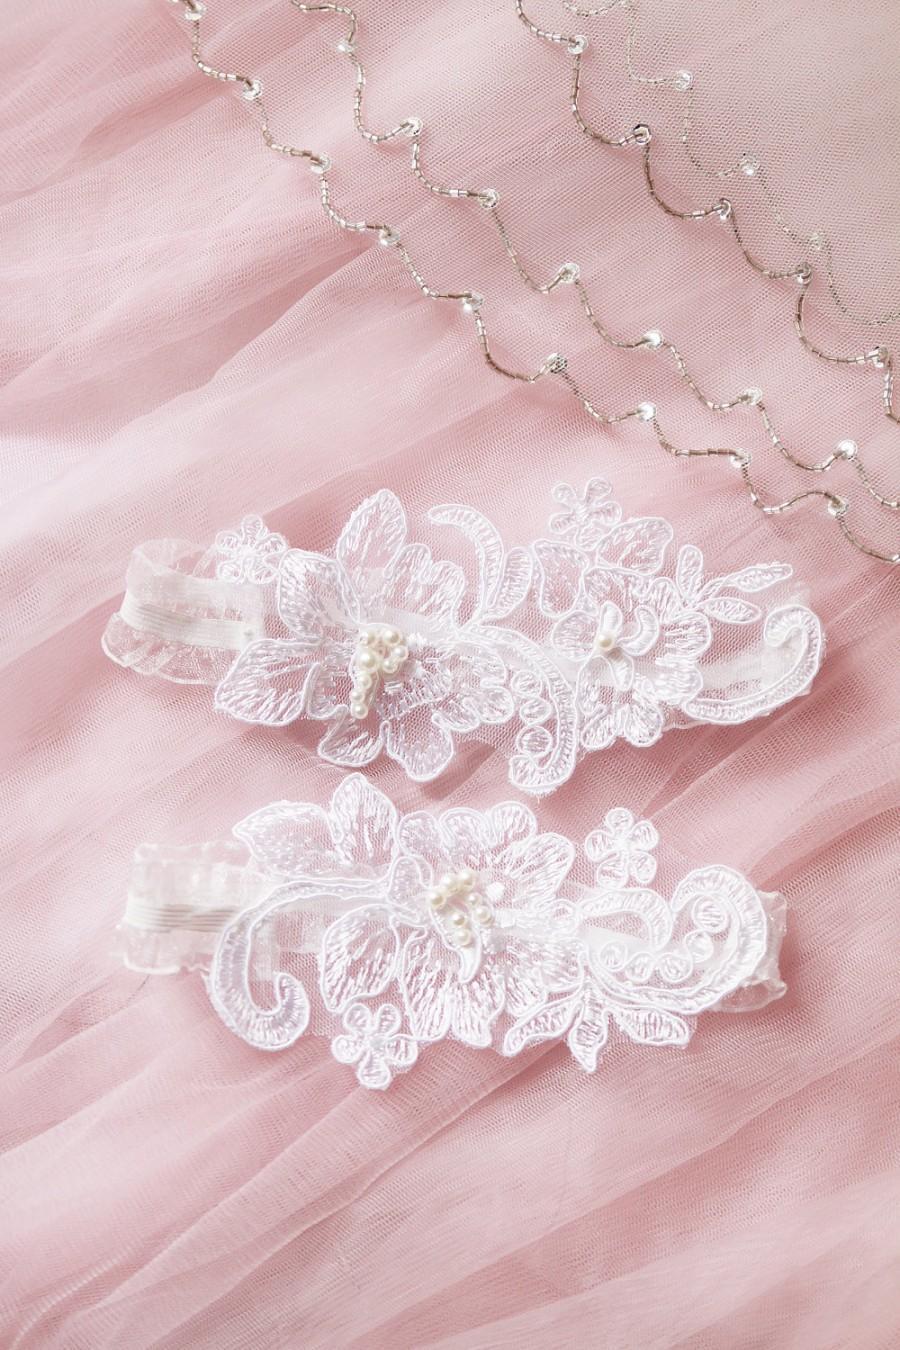 Свадьба - Wedding Garter Set Bridal Garter Belt - Keepsake Garter Toss Garter Included - Ivory Beaded Flower Lace Garter Garters - Vintage Inspired